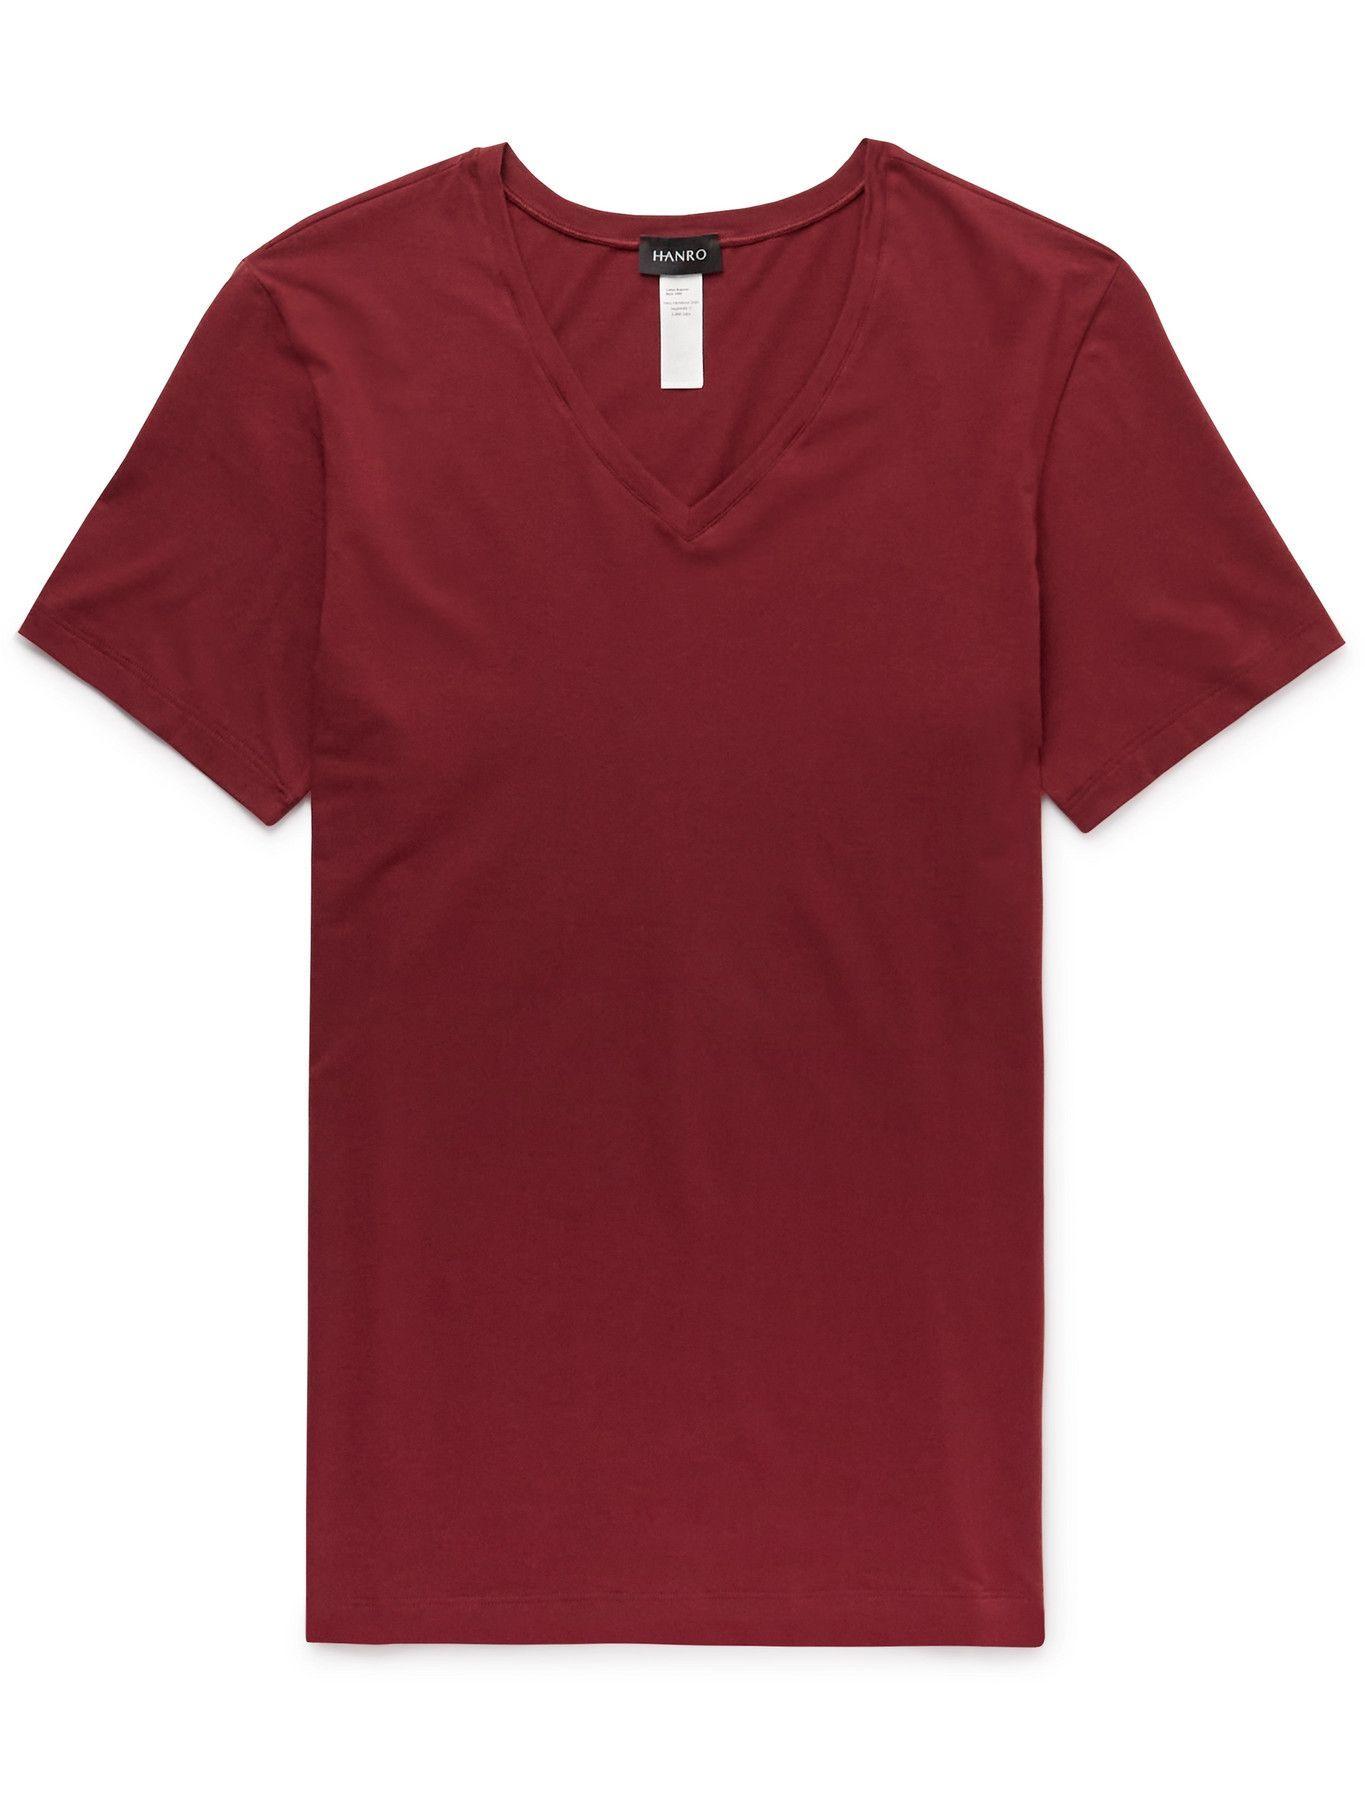 Hanro - Mercerised Cotton-Blend V-Neck T-Shirt - Red